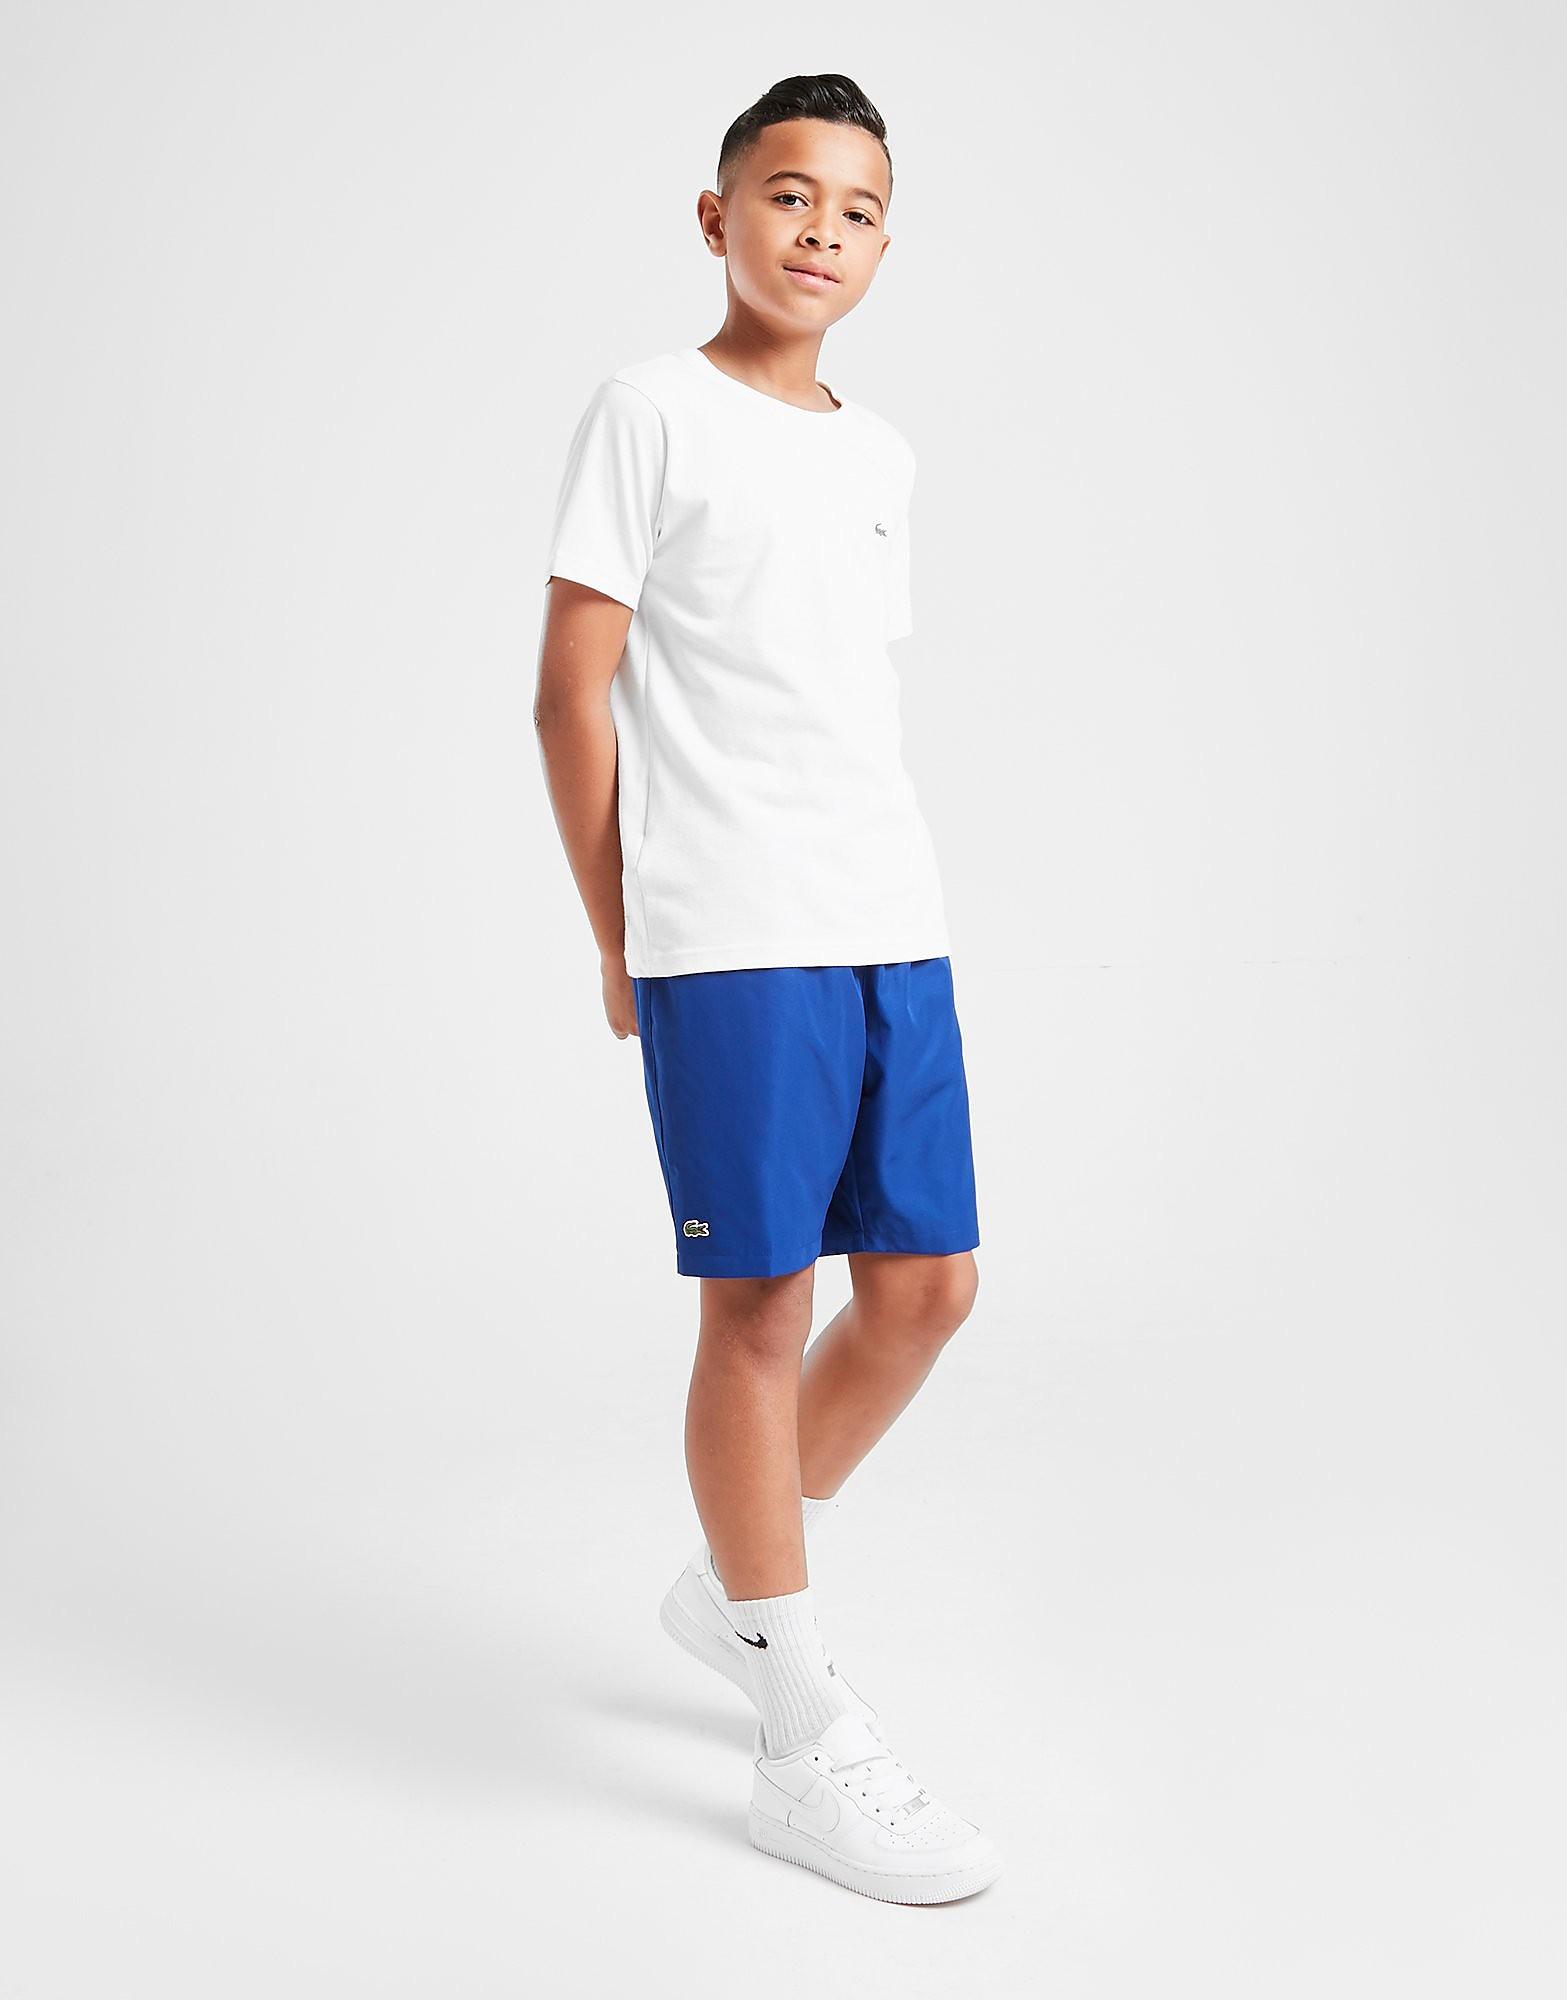 Lacoste Woven Shorts Junior Blauw Kind Blauw